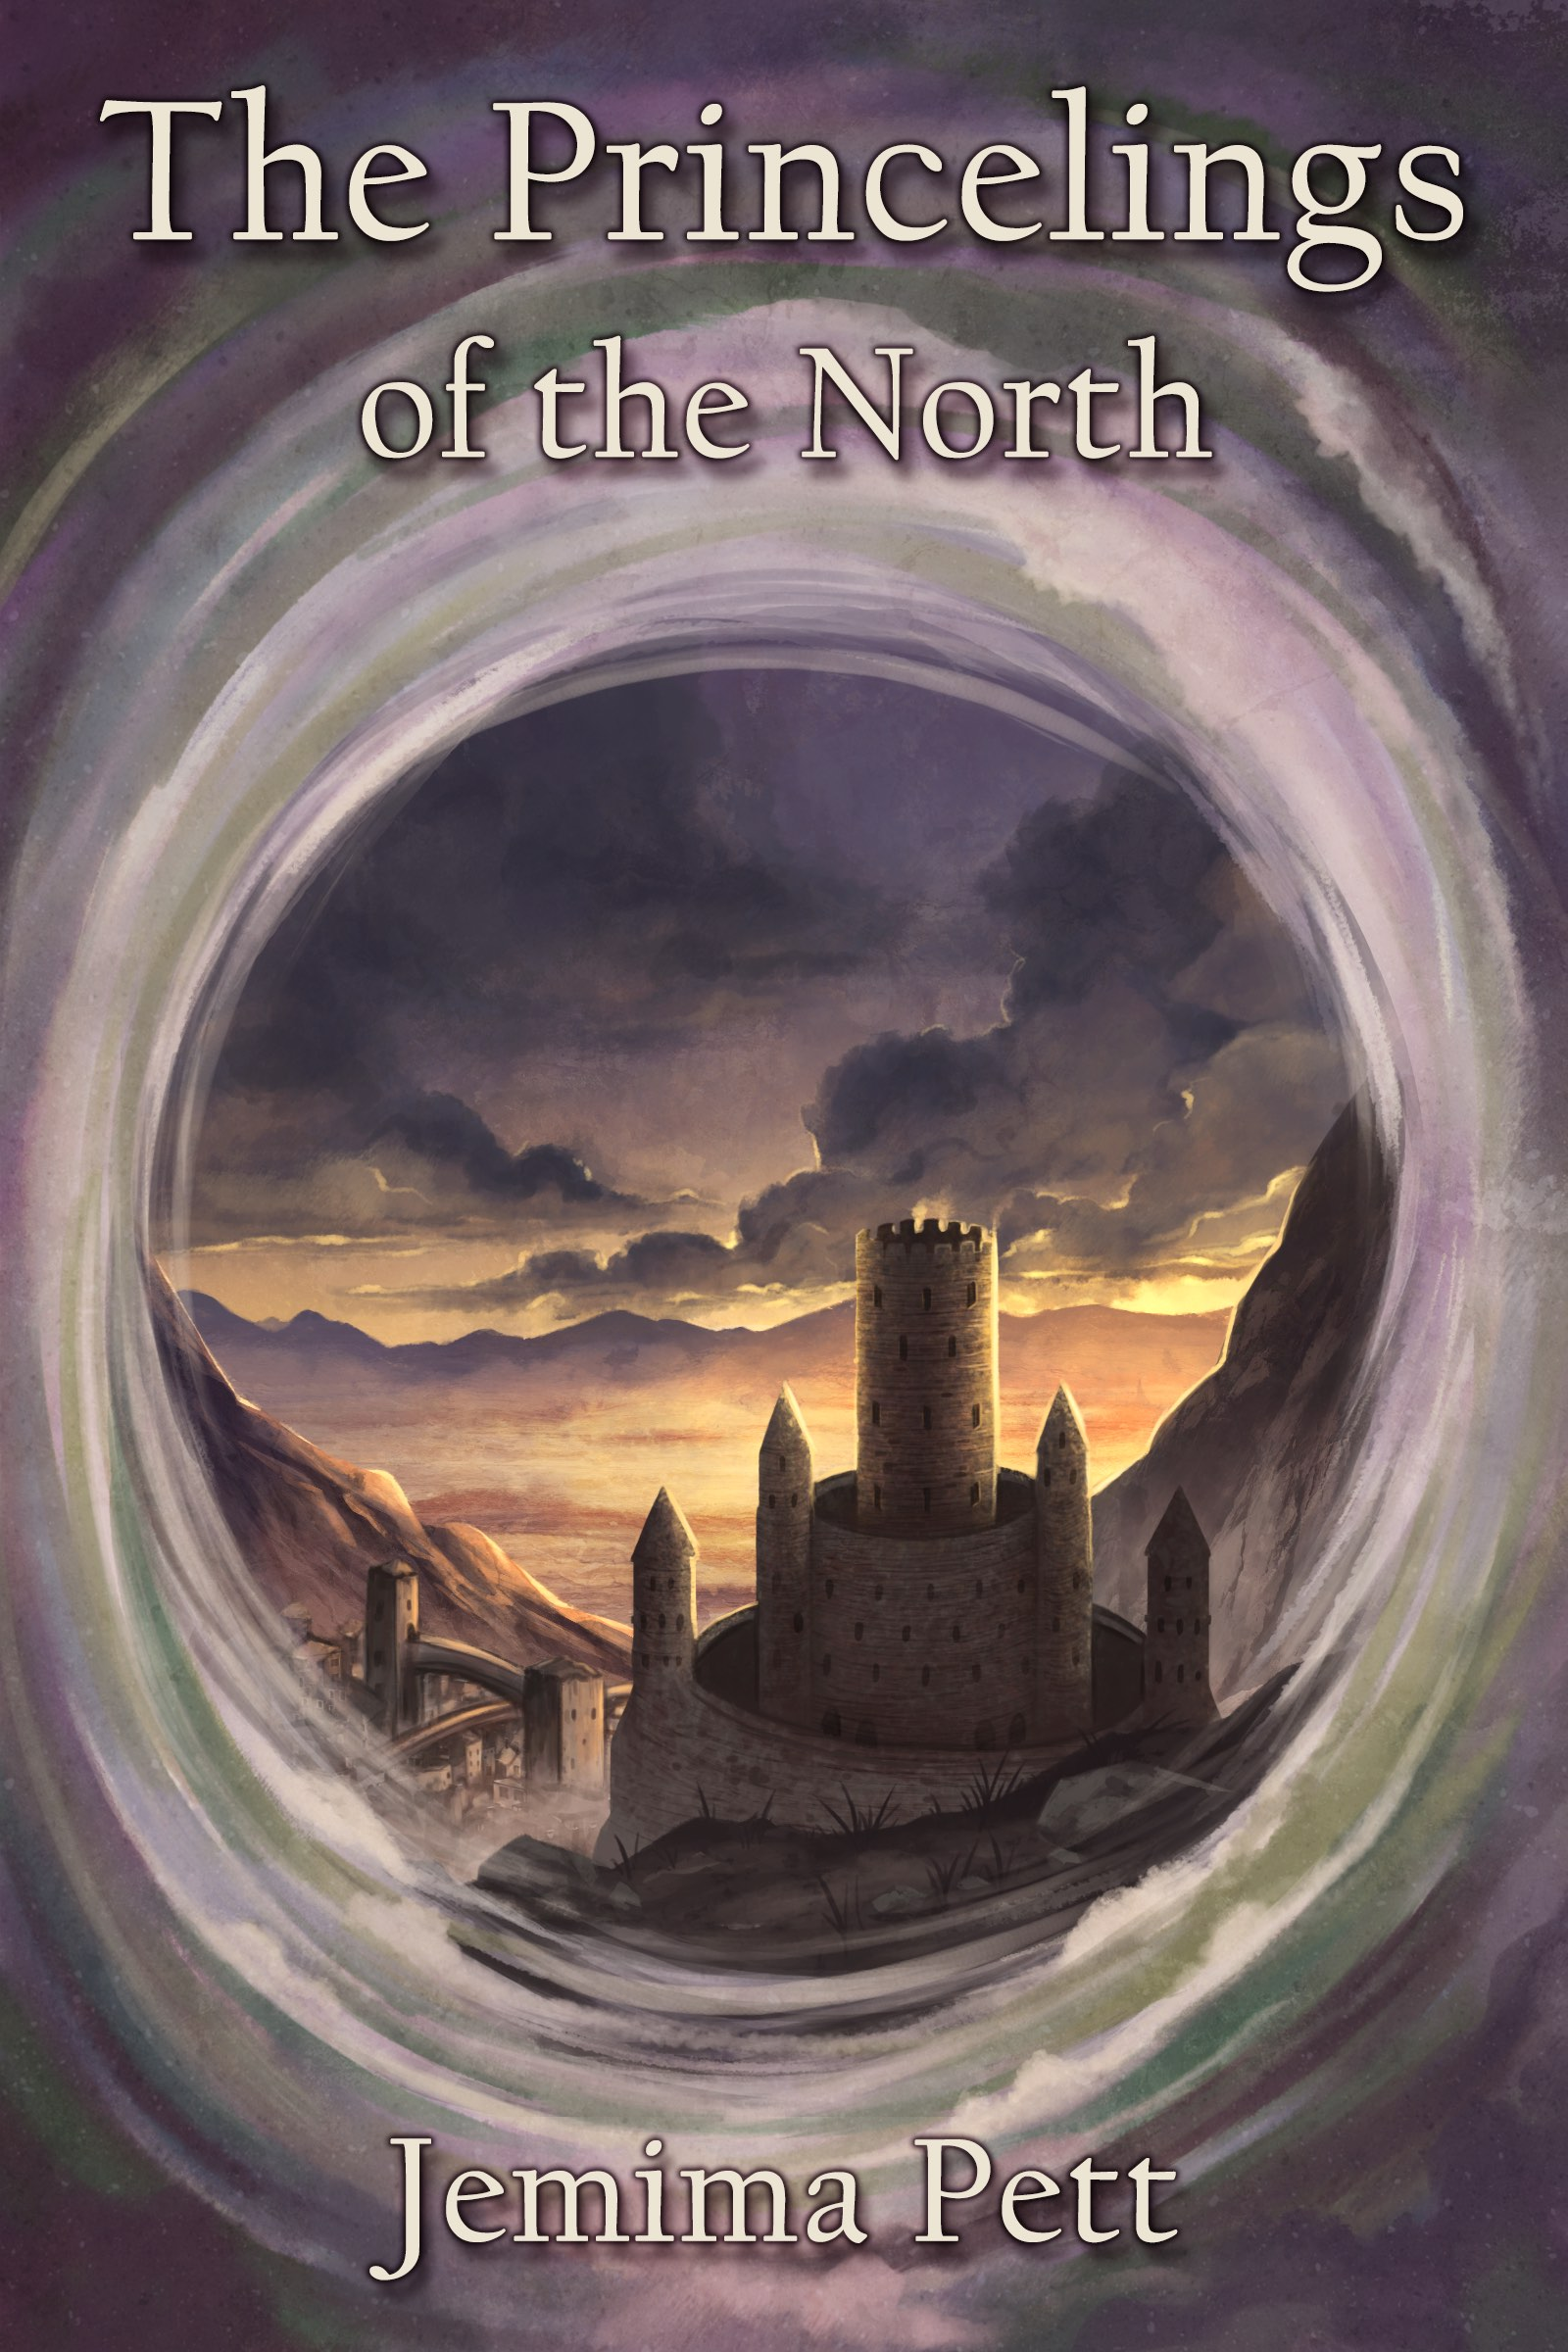 princelings-north-kindle